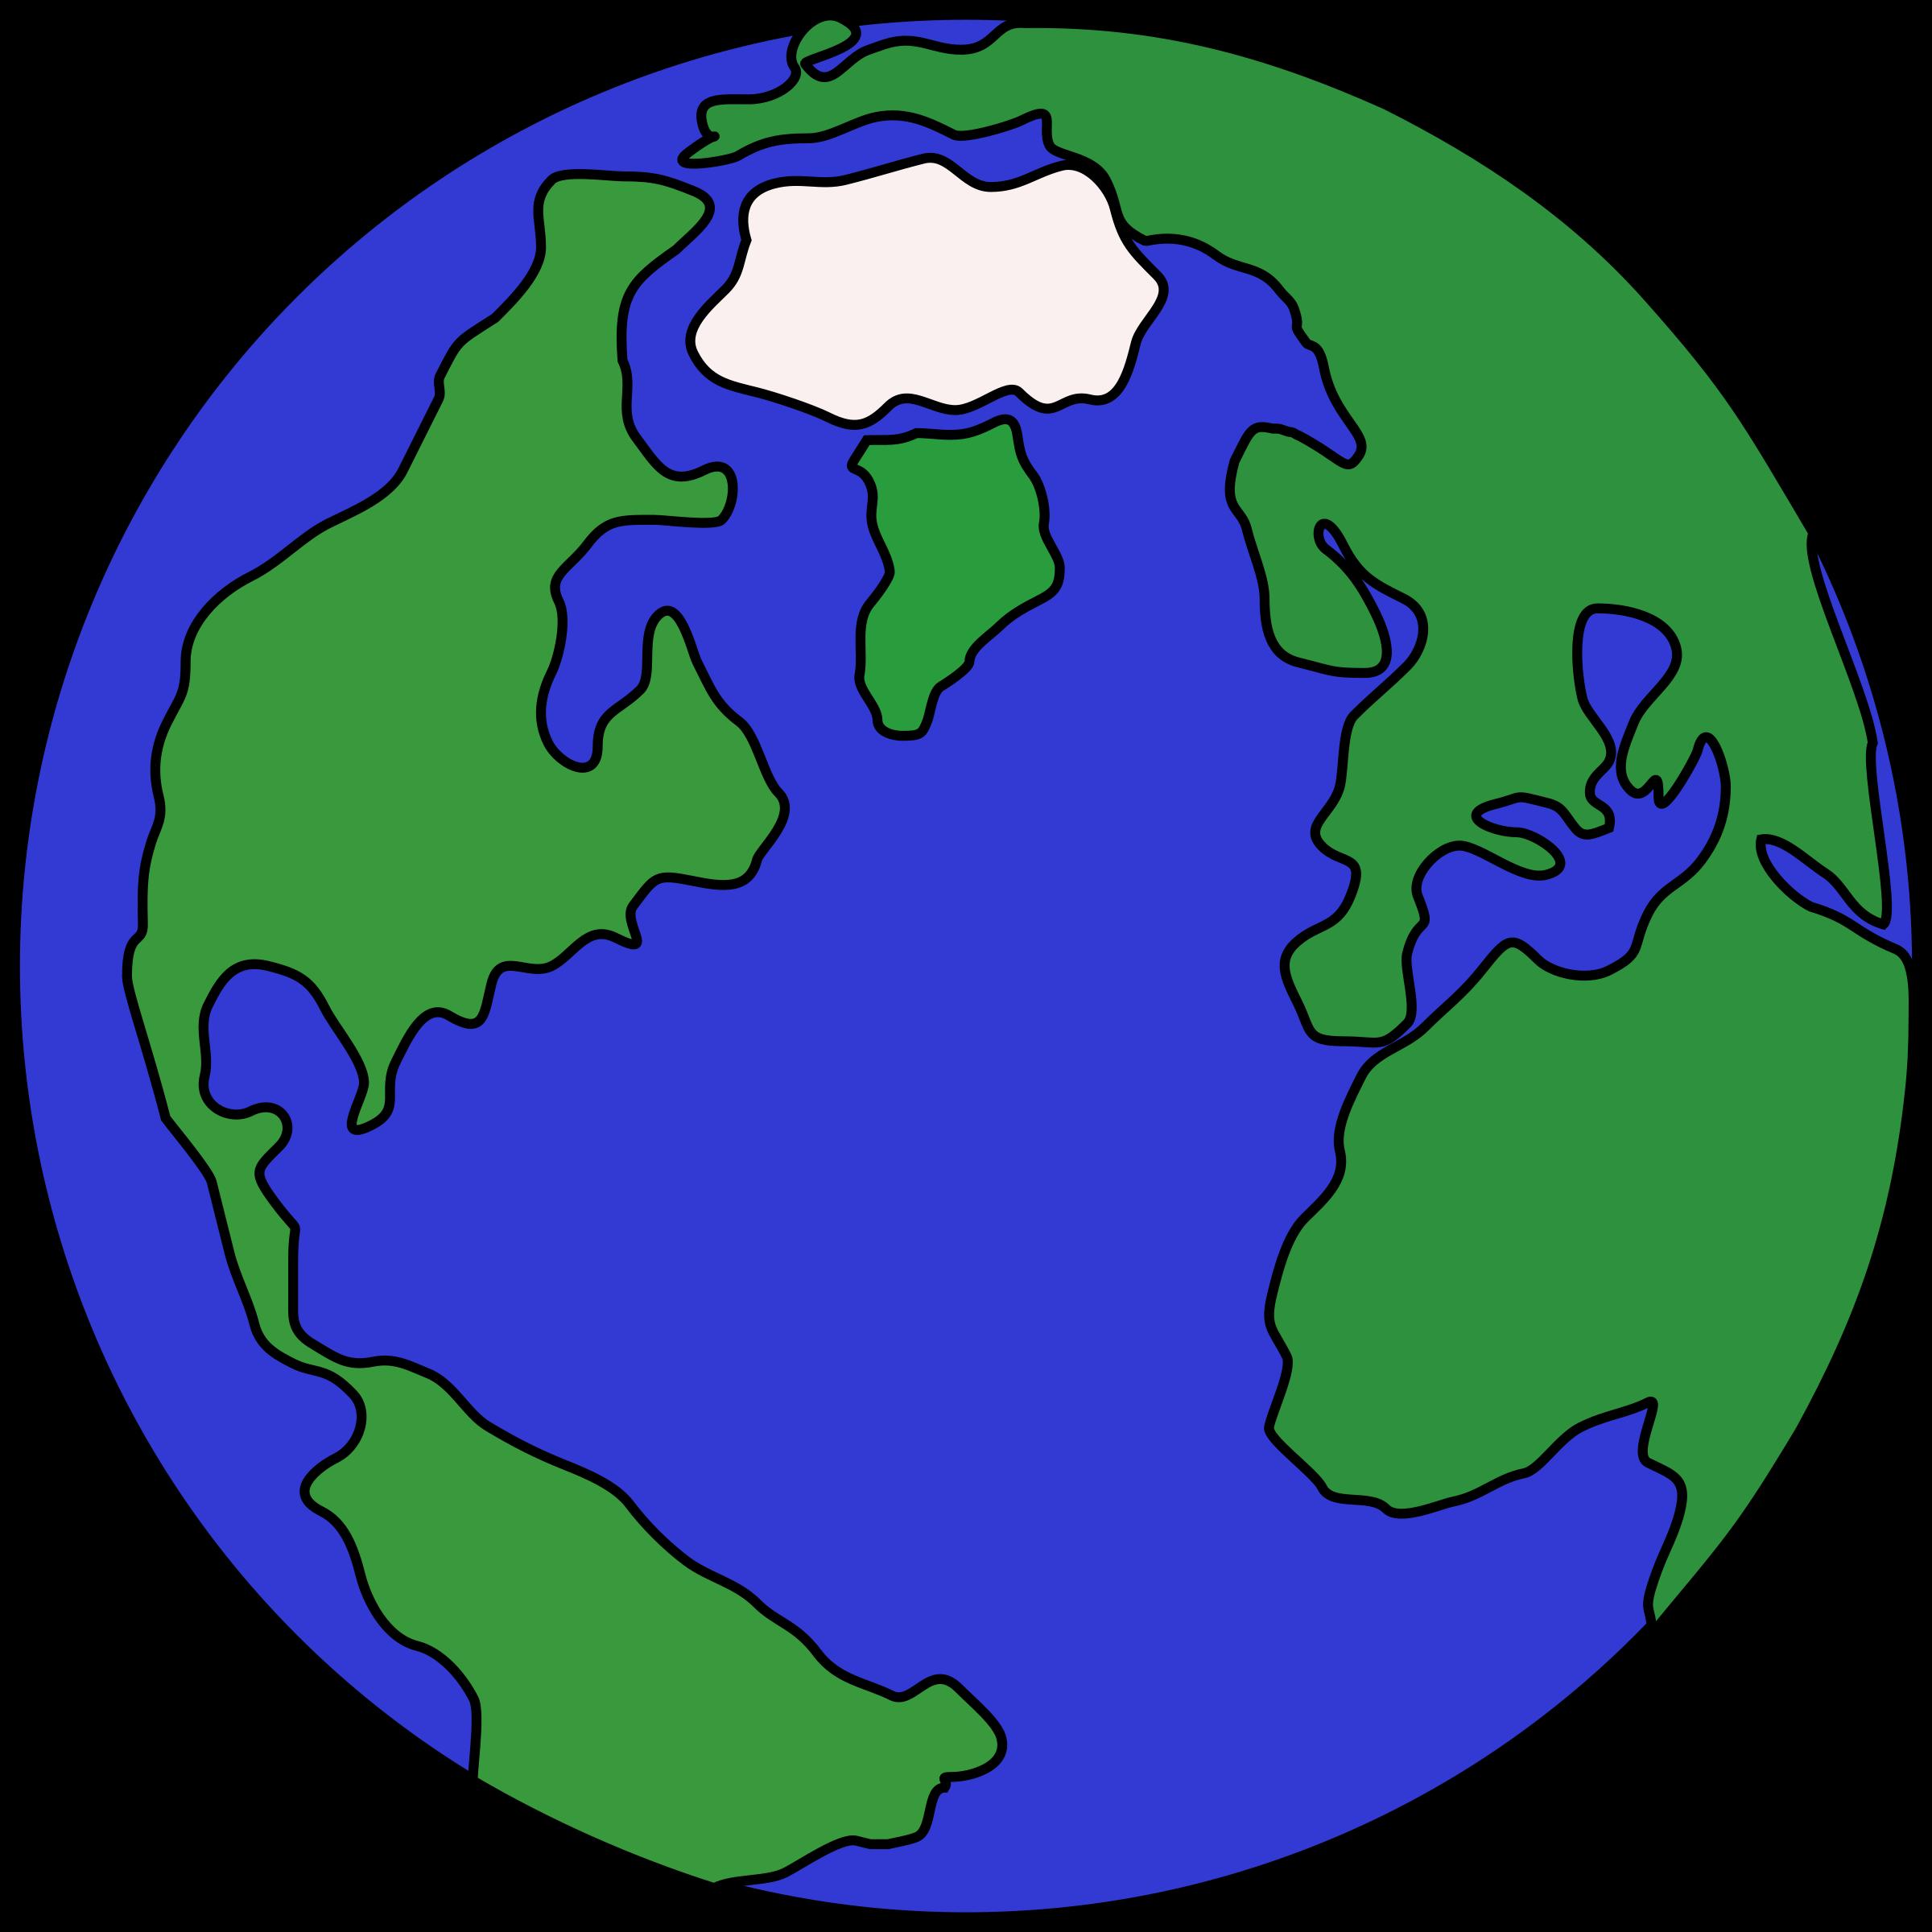 2400x2400 Planet Clipart